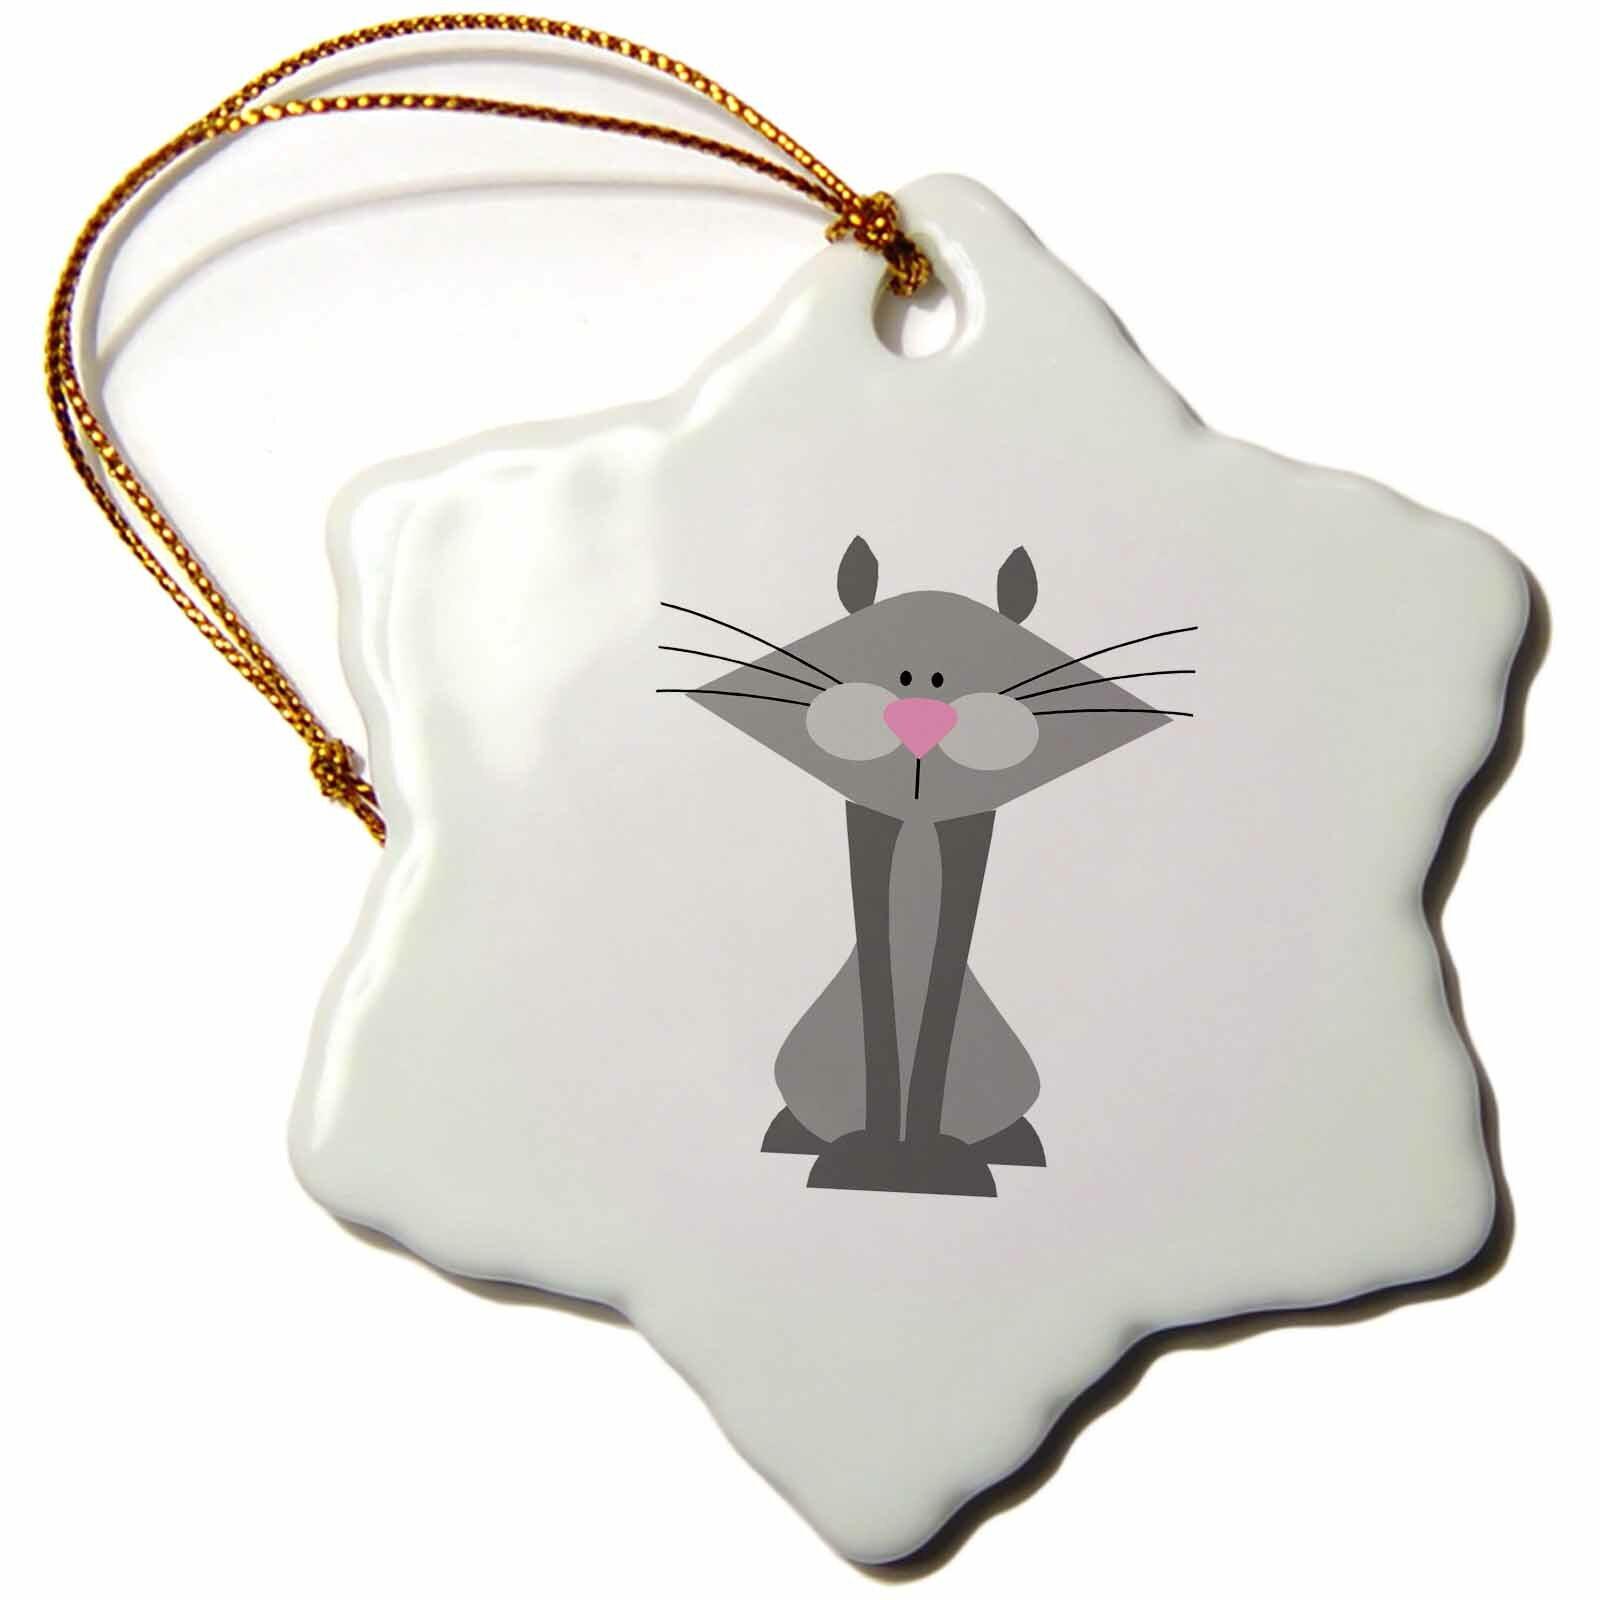 The Holiday Aisle Snowflake Ornament Cartoon Grey Kitty Cat 3 Inches 2b28200b1c6e42798107a01410df57fd Wayfair Ca